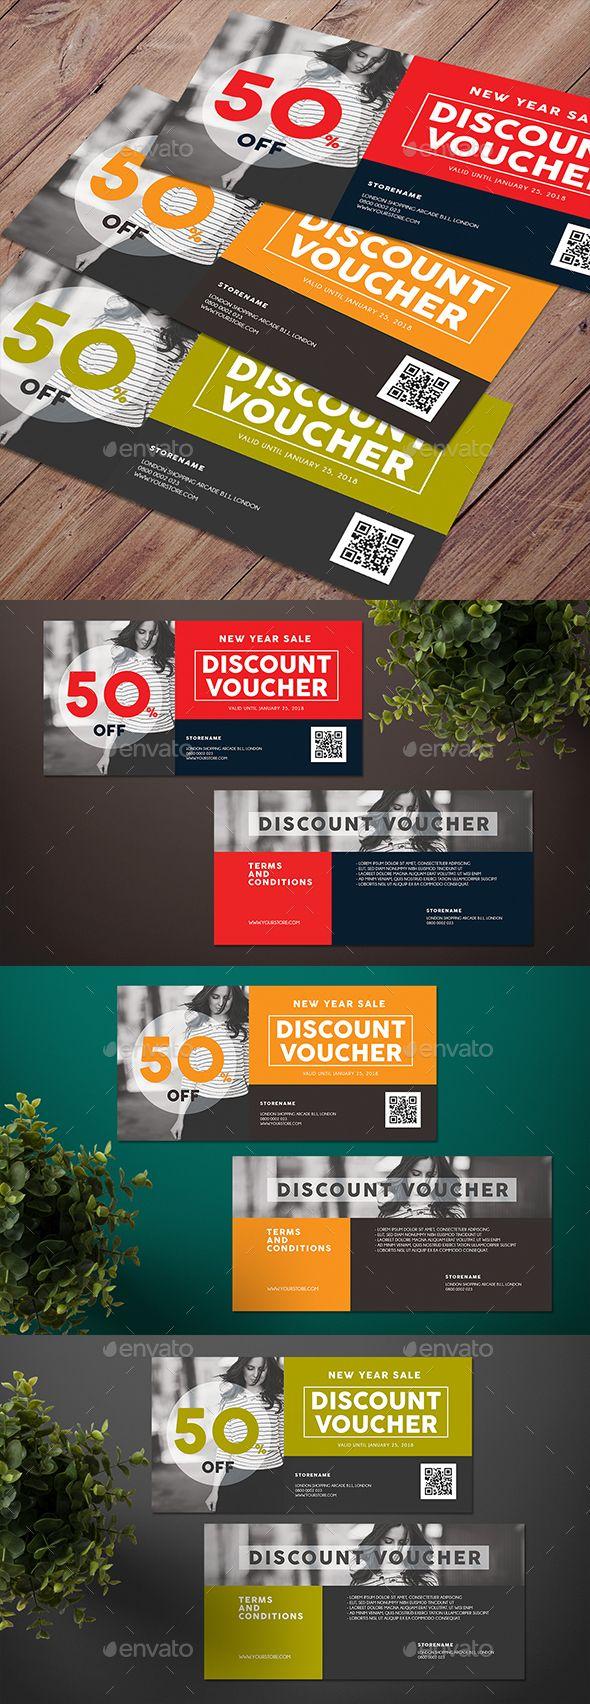 Design of discount card - 25 Best Loyalty Card Design Ideas On Pinterest Salon Promotions Esthetics Definition And Loyalty Rewards Program